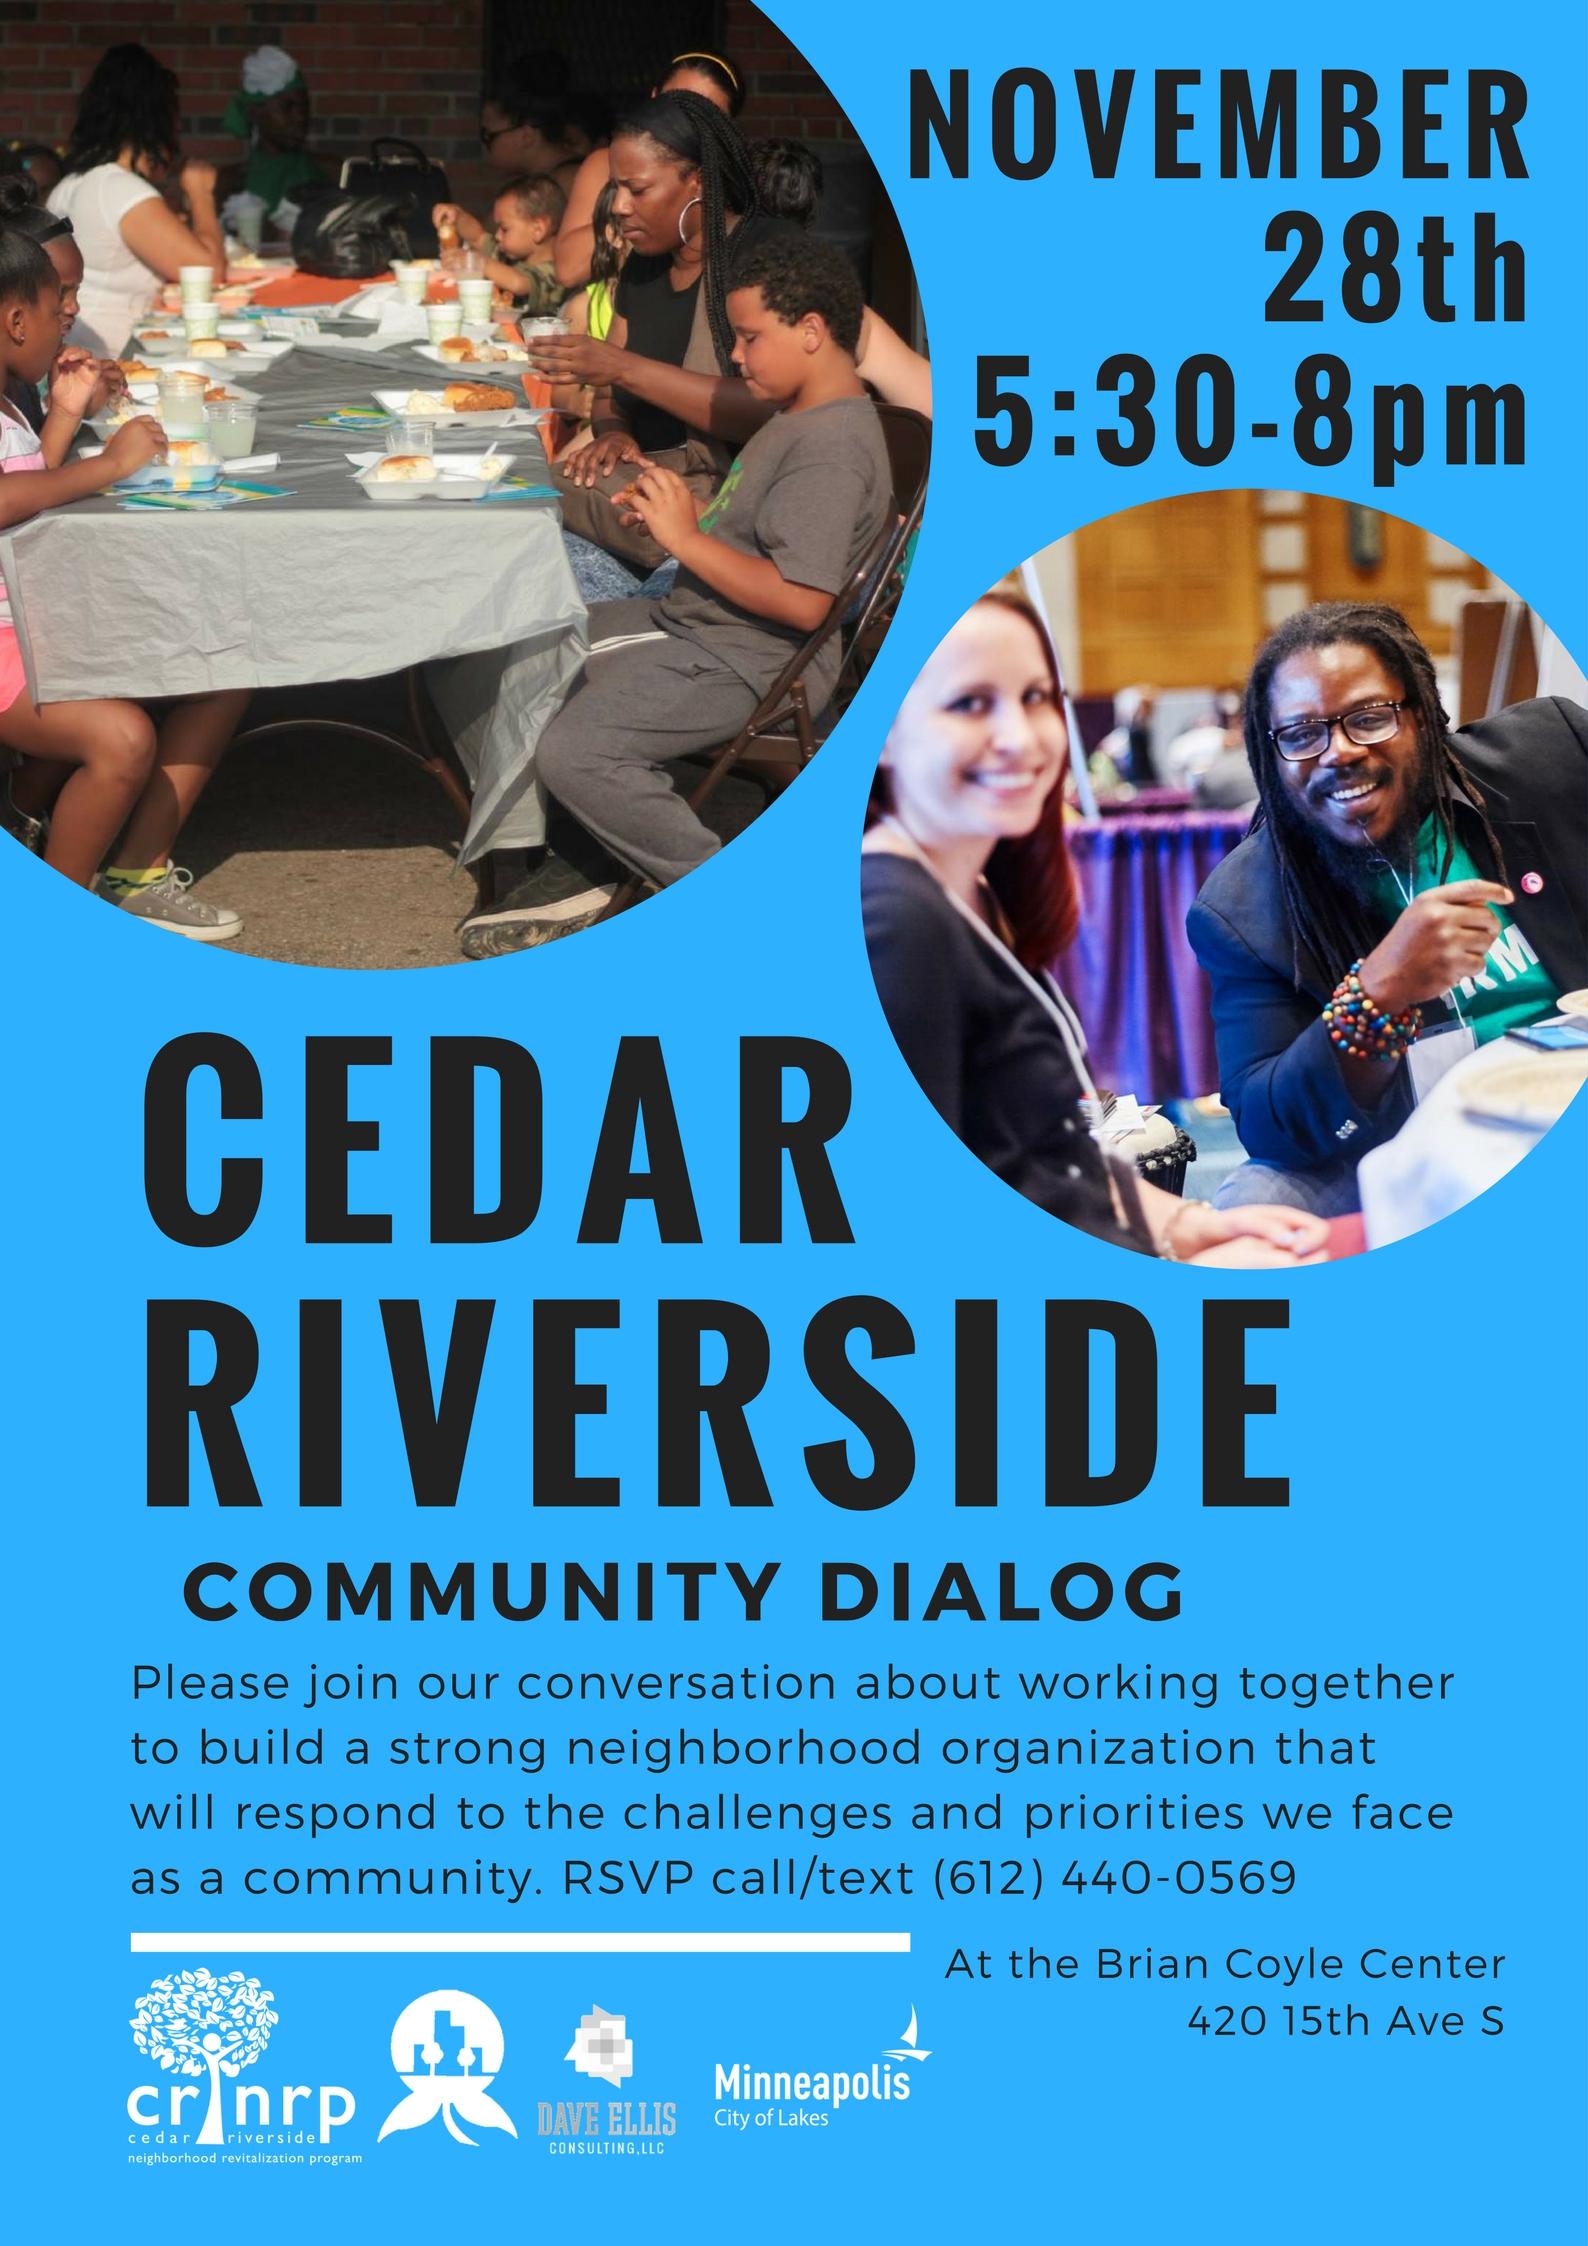 Cedar_Riverside_Community_Gathering_(1).jpg